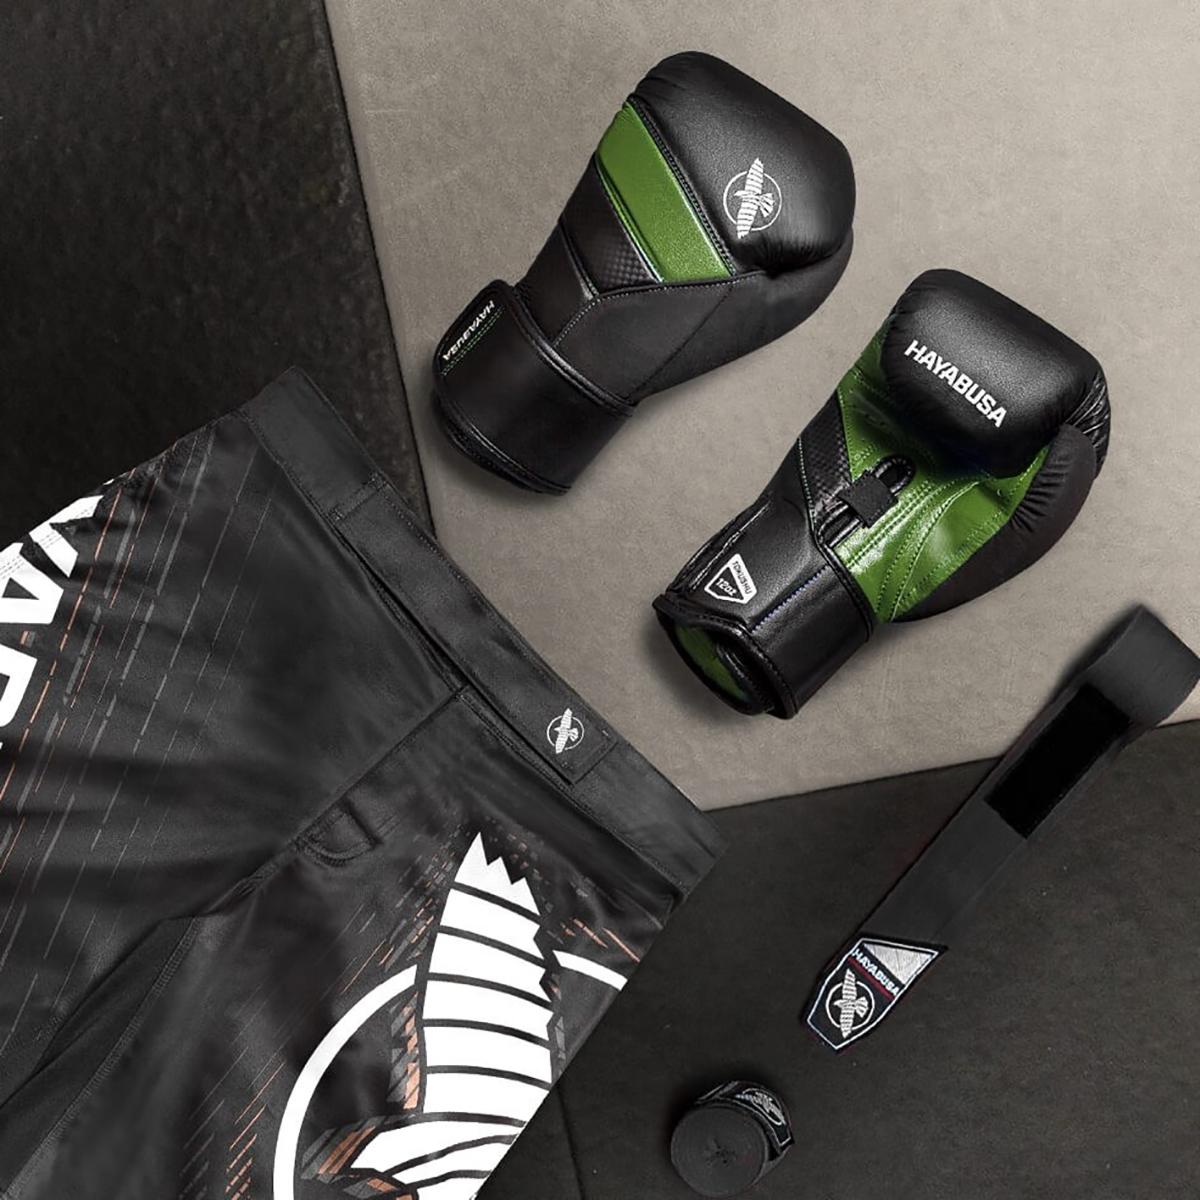 Hayabusa-T3-Dual-X-Hook-and-Loop-Closure-Vylar-Leather-Training-Boxing-Gloves thumbnail 14